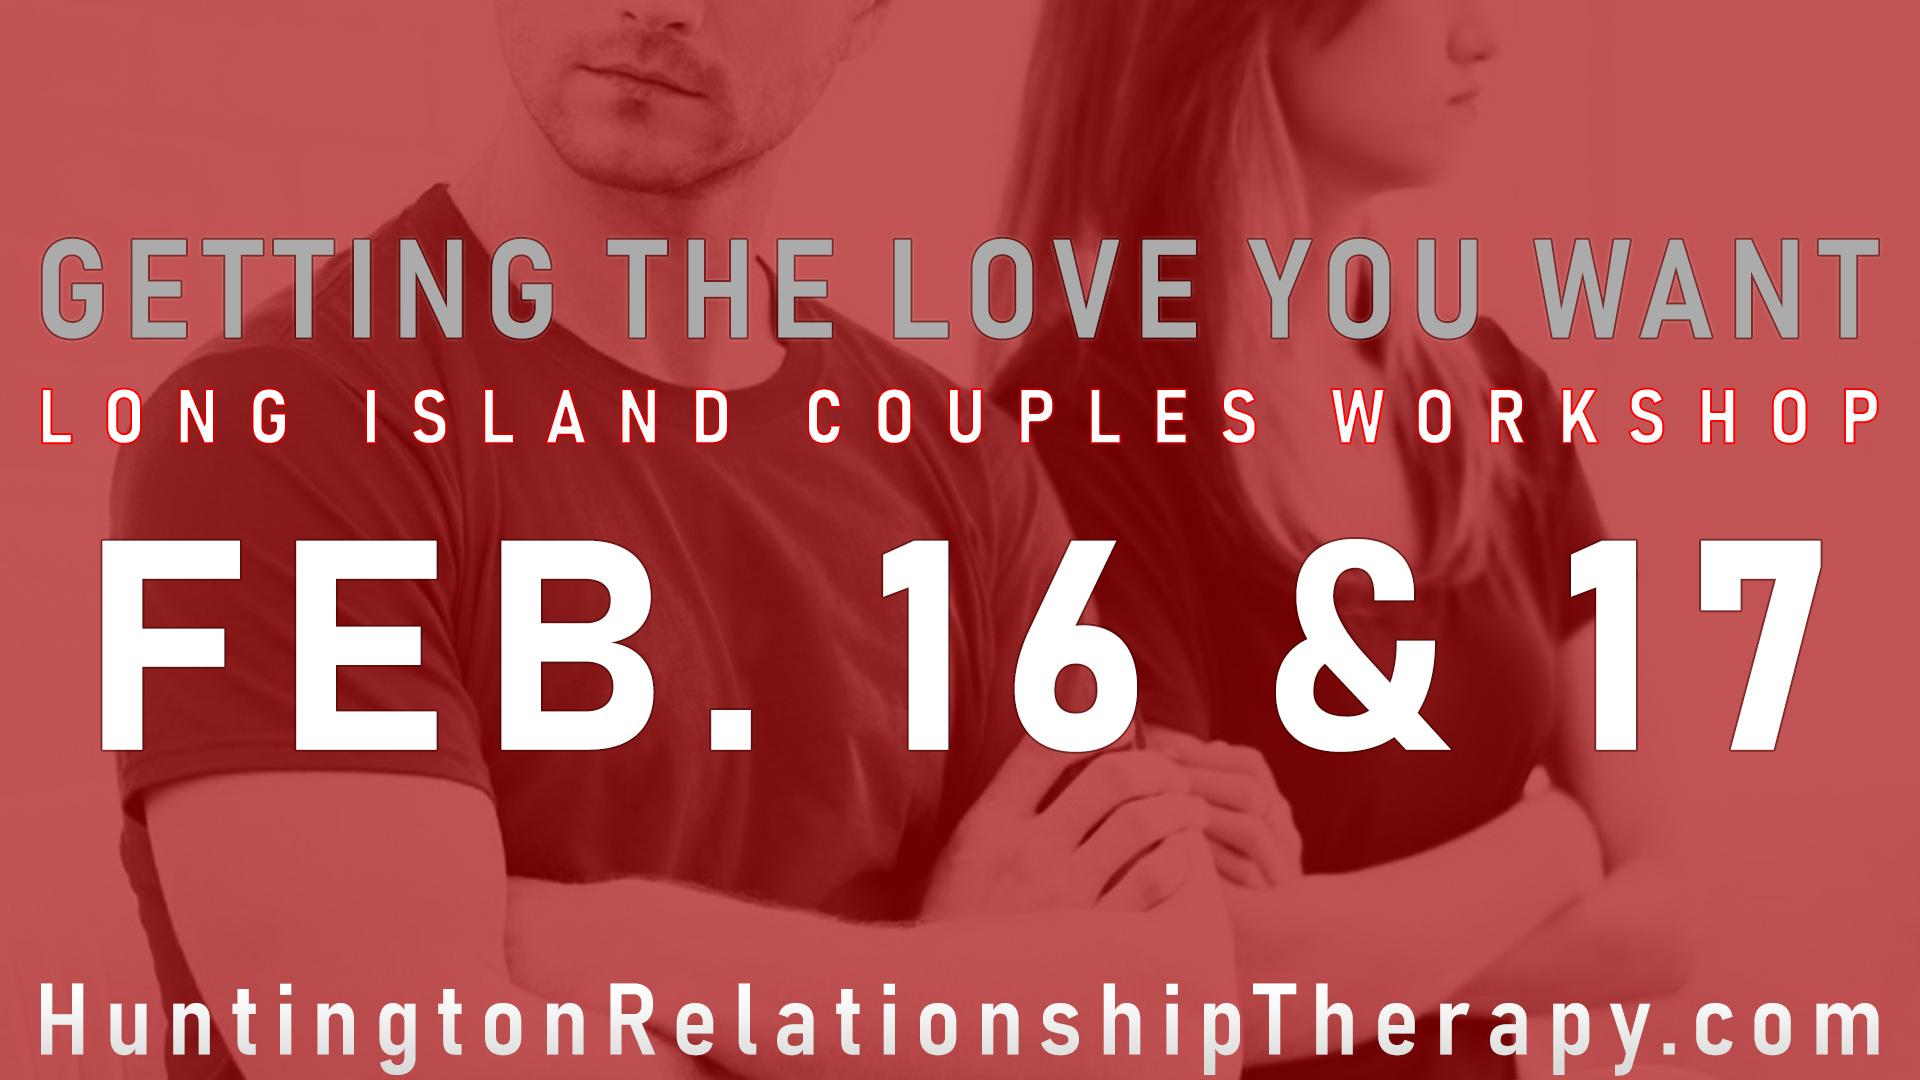 Long Island Couples Workshop February 16 & 17, 2019